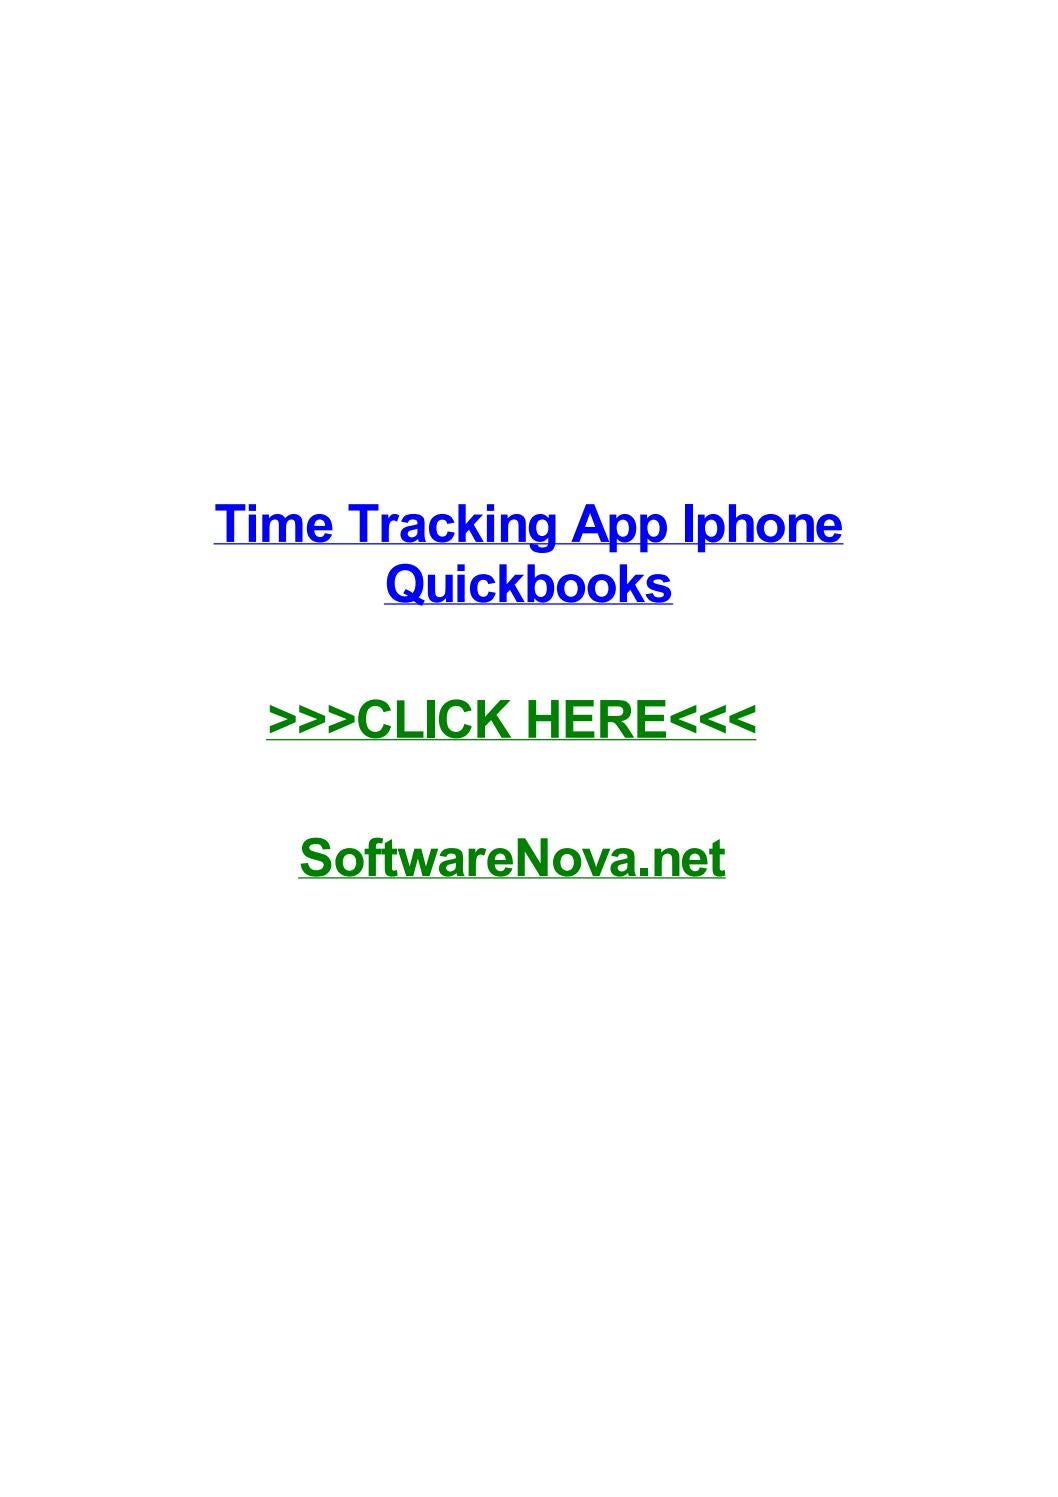 Time tracking app iphone quickbooks by zhangtaoatnc - issuu